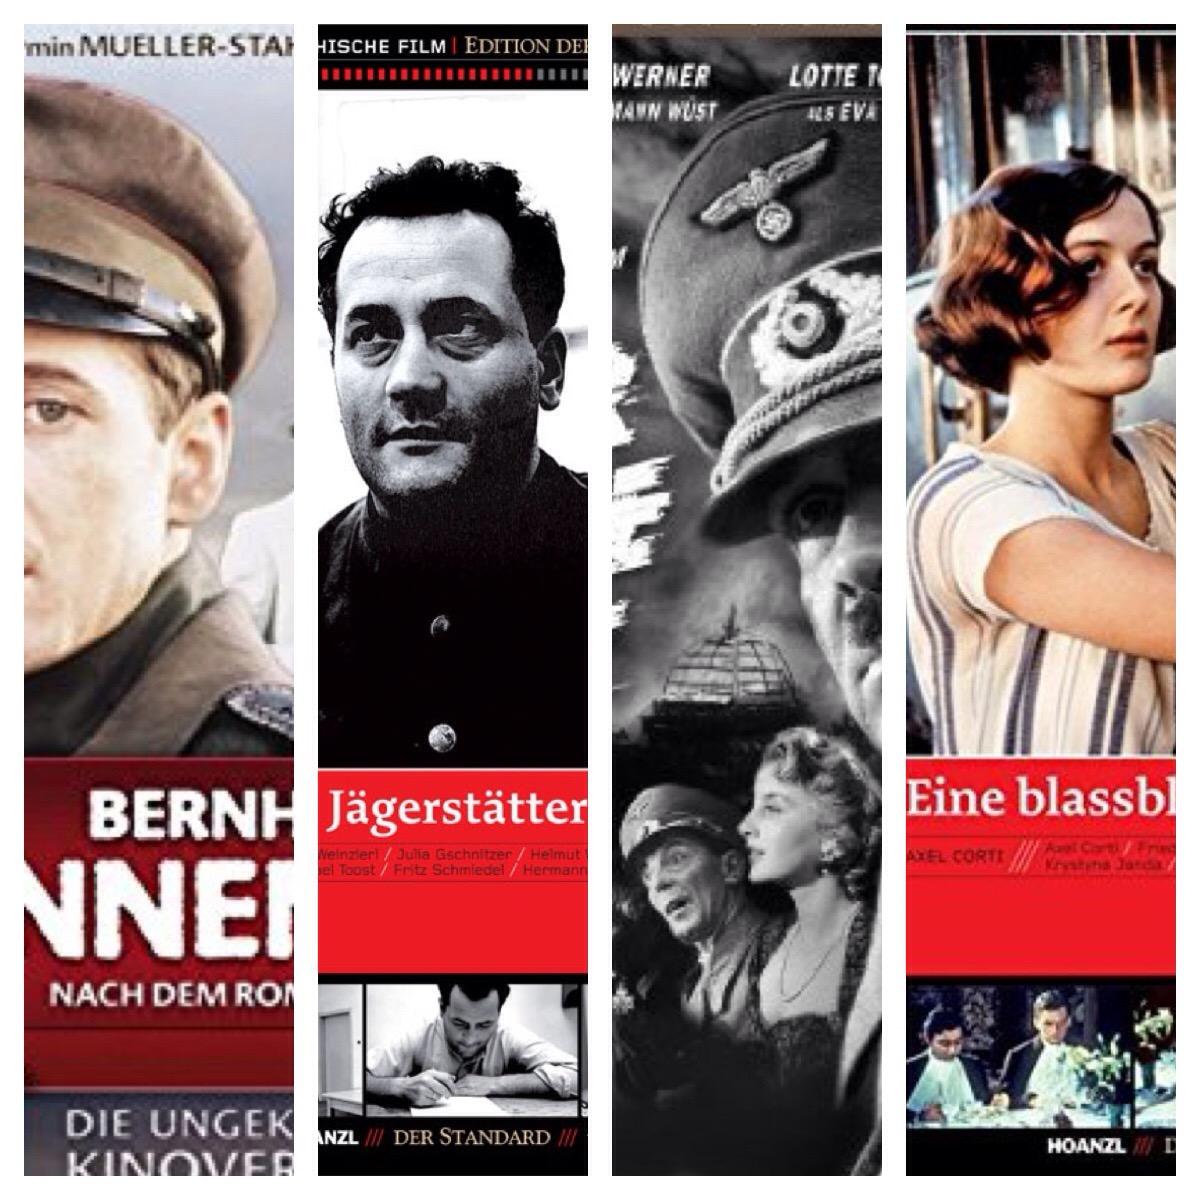 Corti, Wicki, Pabst, Filmklassiker - kekinwien.at